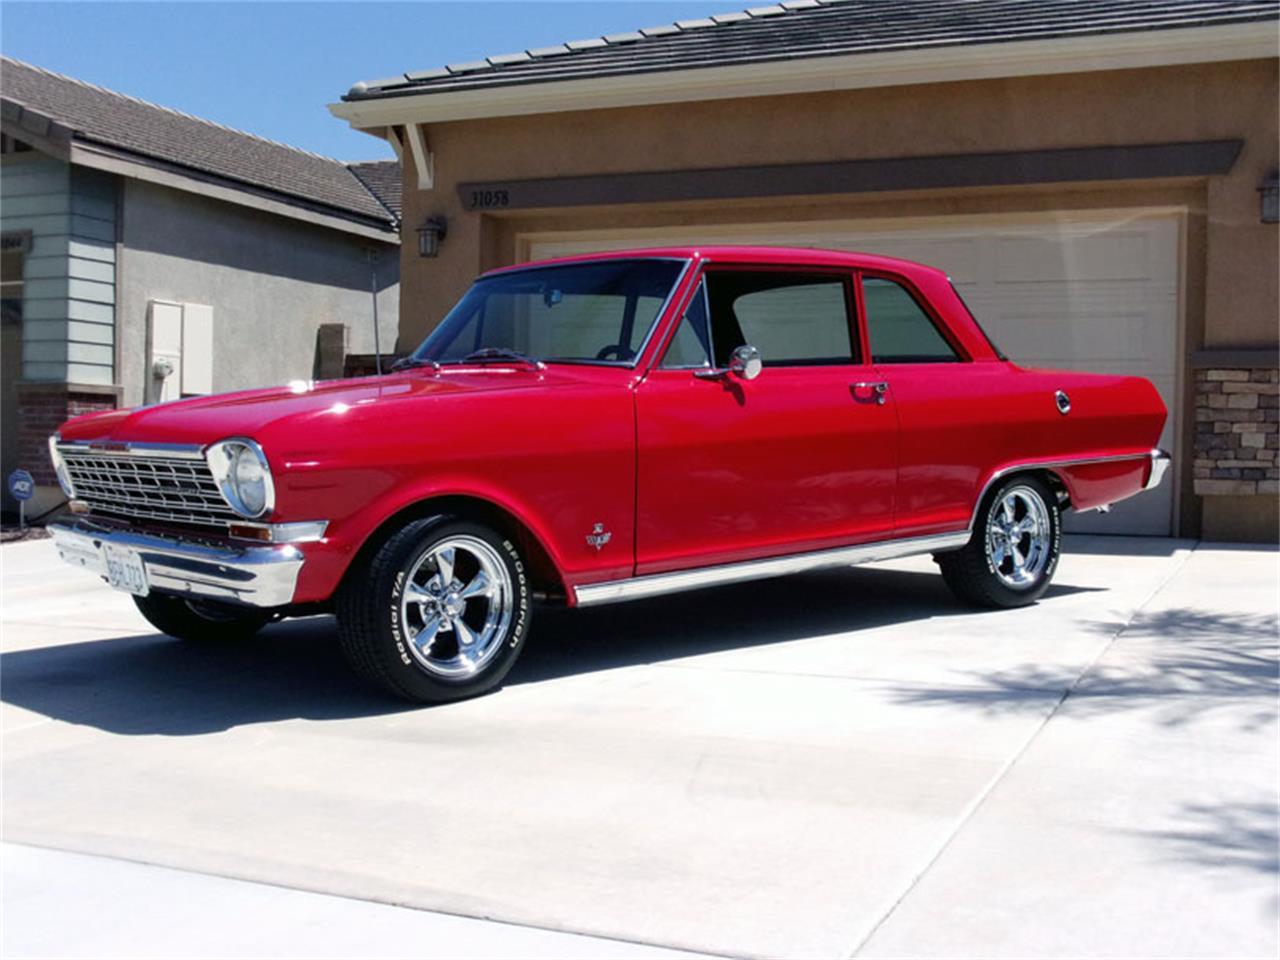 Muncie Car Dealers >> 1963 Chevrolet Nova II for Sale | ClassicCars.com | CC-1139531